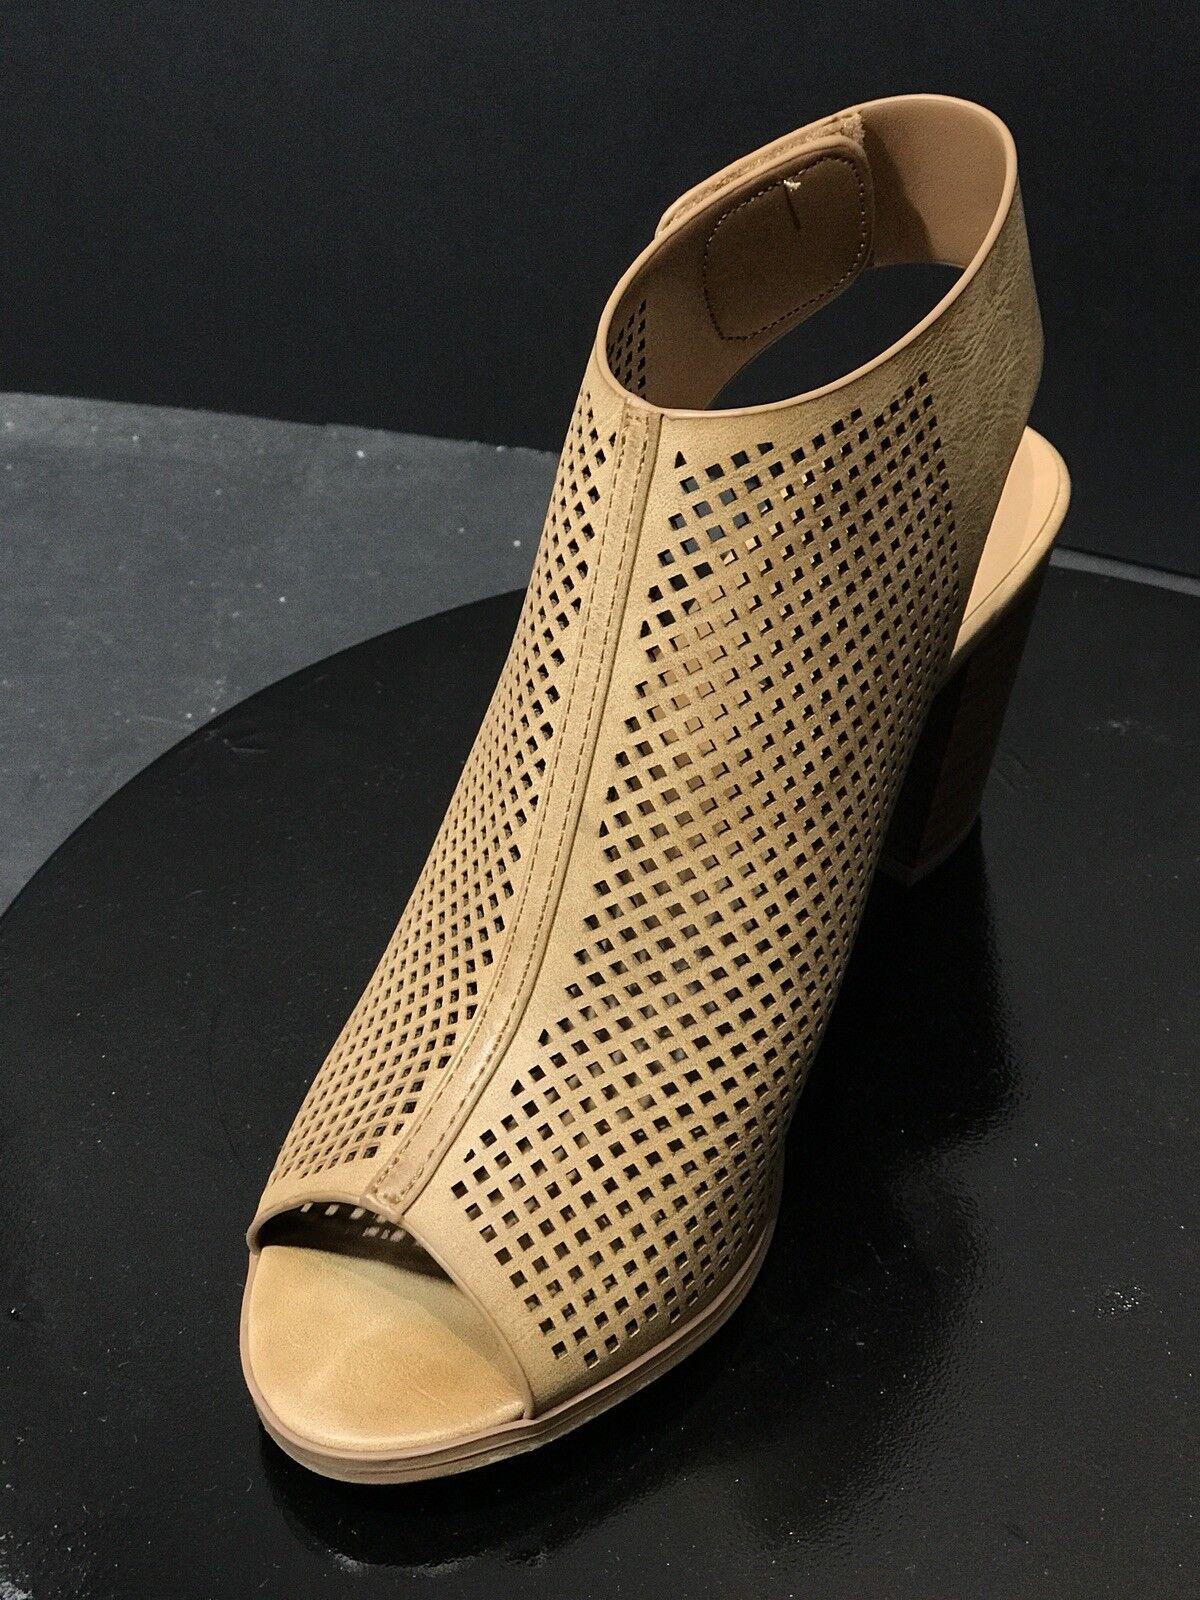 City Toe Classified Women Leatherette Peep Toe City Perforated Chunky Heel Mule Size US 9 2ec4e8